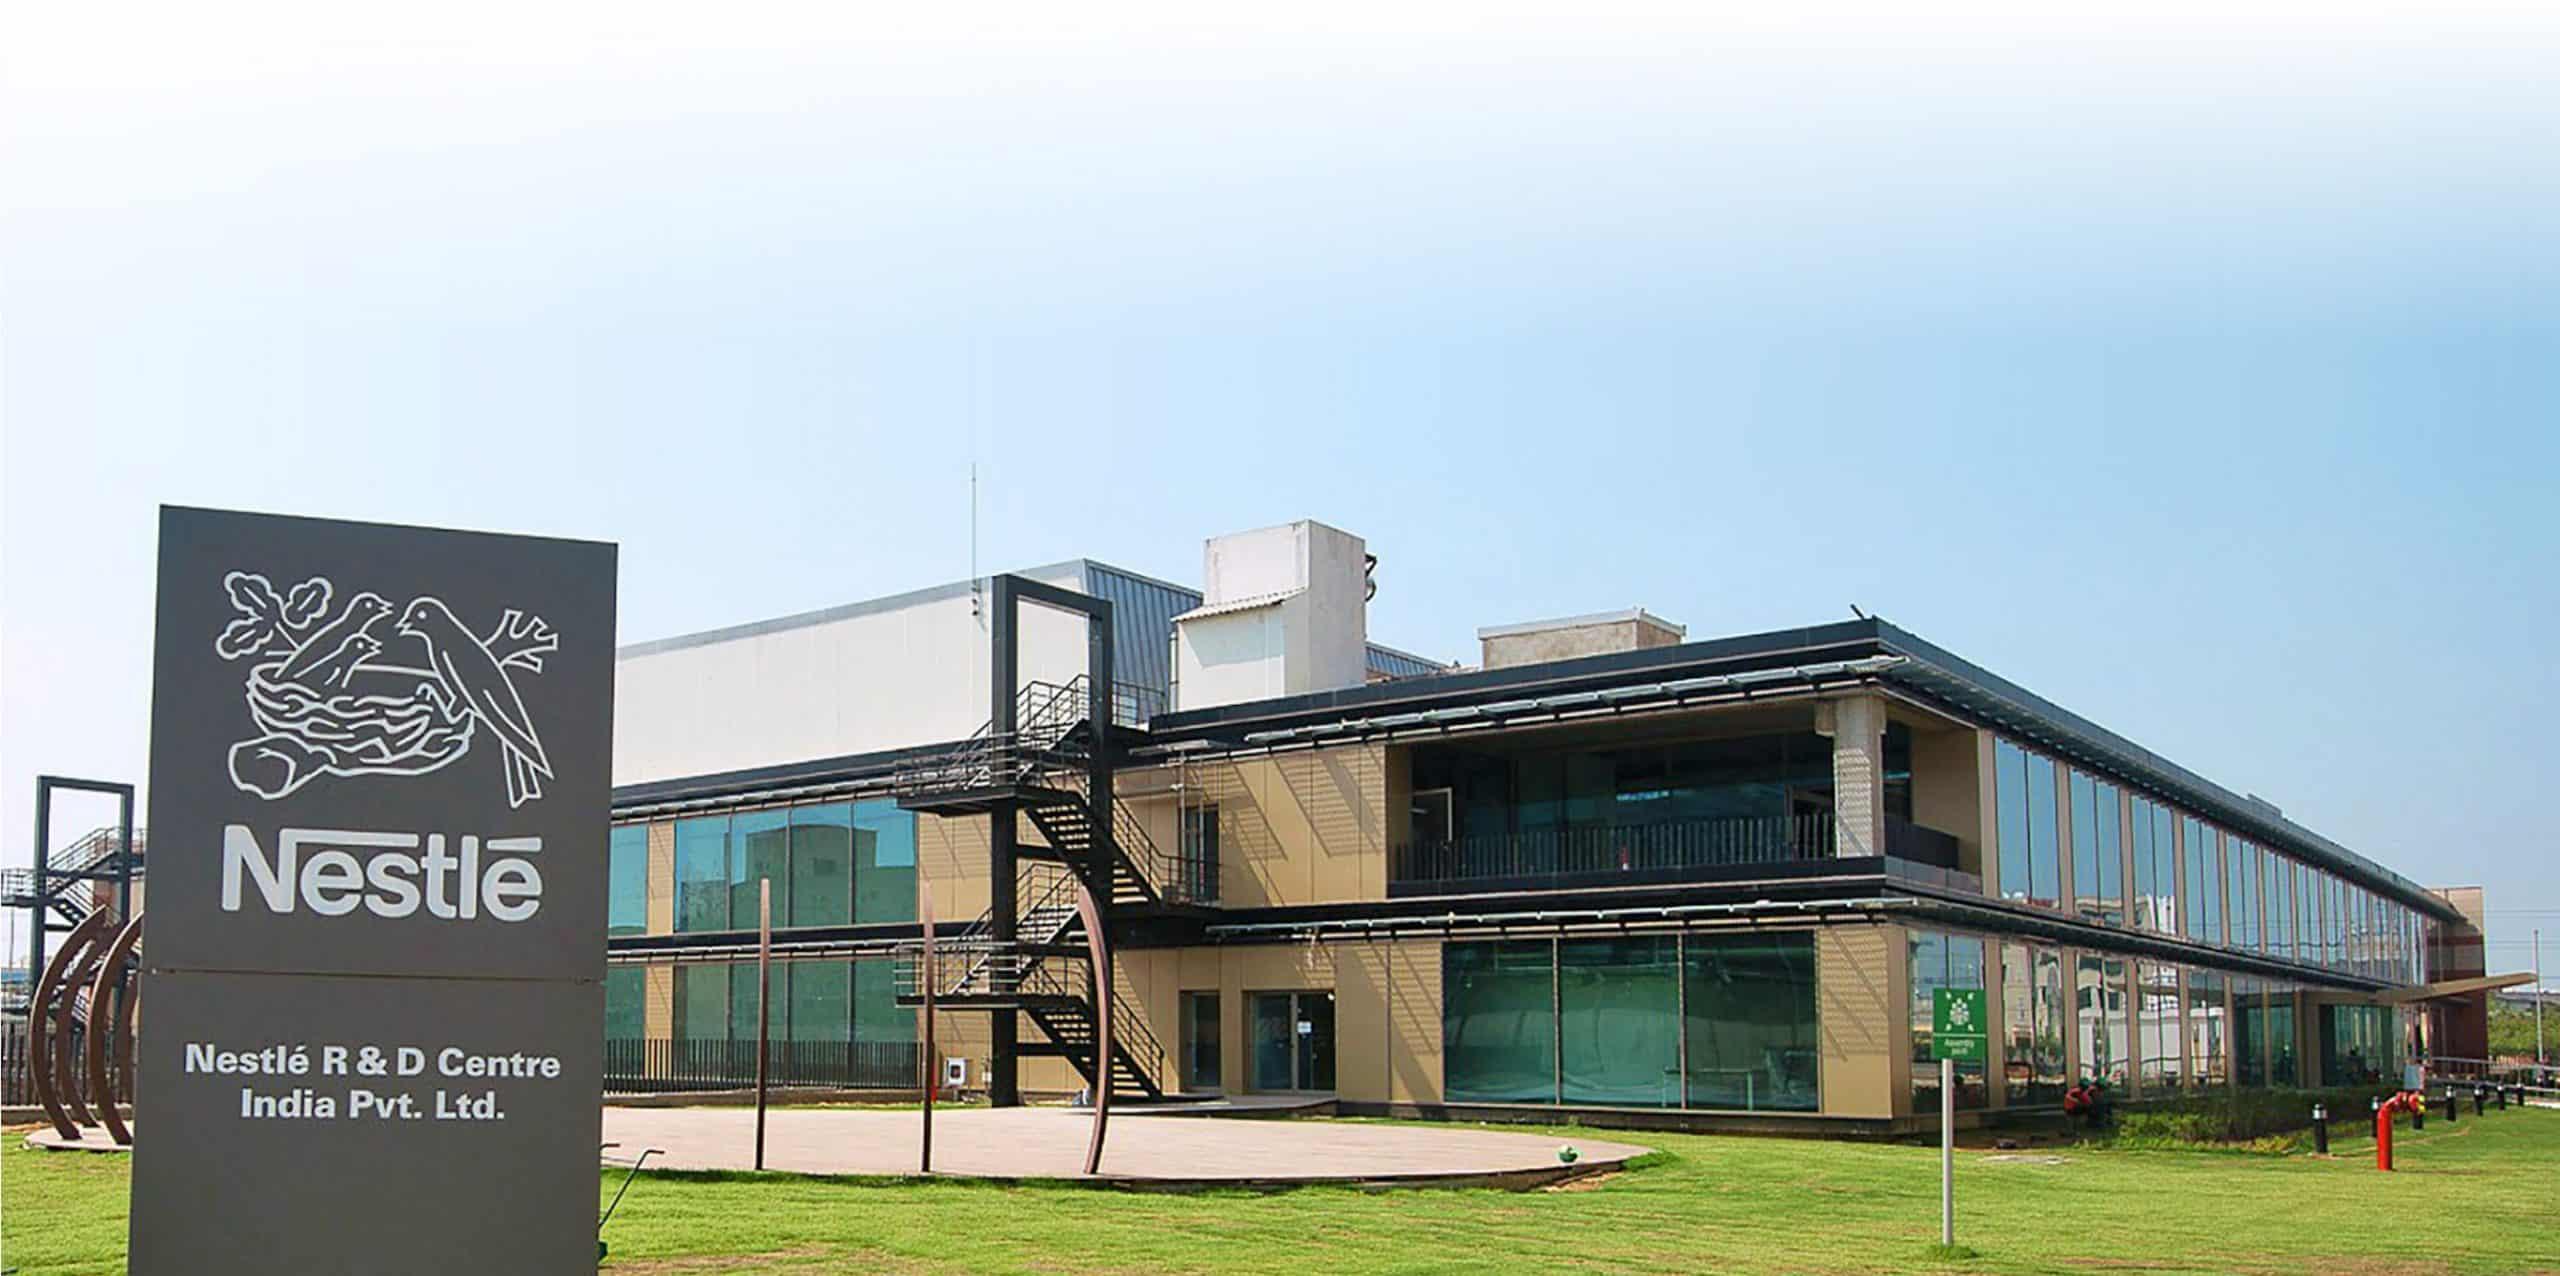 Nestlé India's R&D center in Manesar, Haryana, India